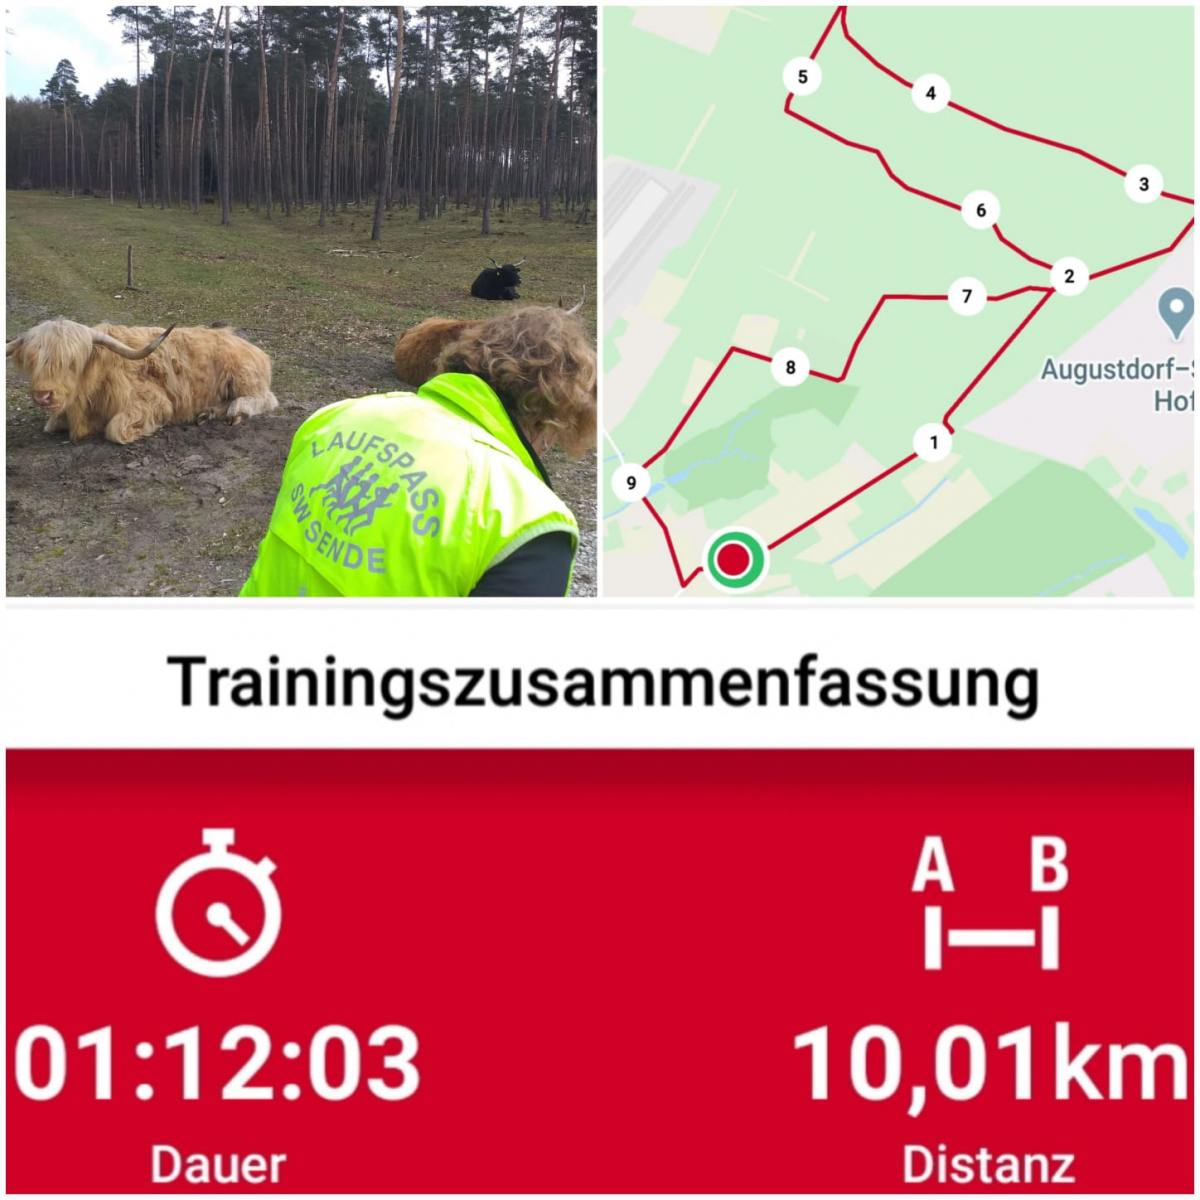 Herrmann-Martina-14-Challenge-Wistinghauser-Senne-2BNtf